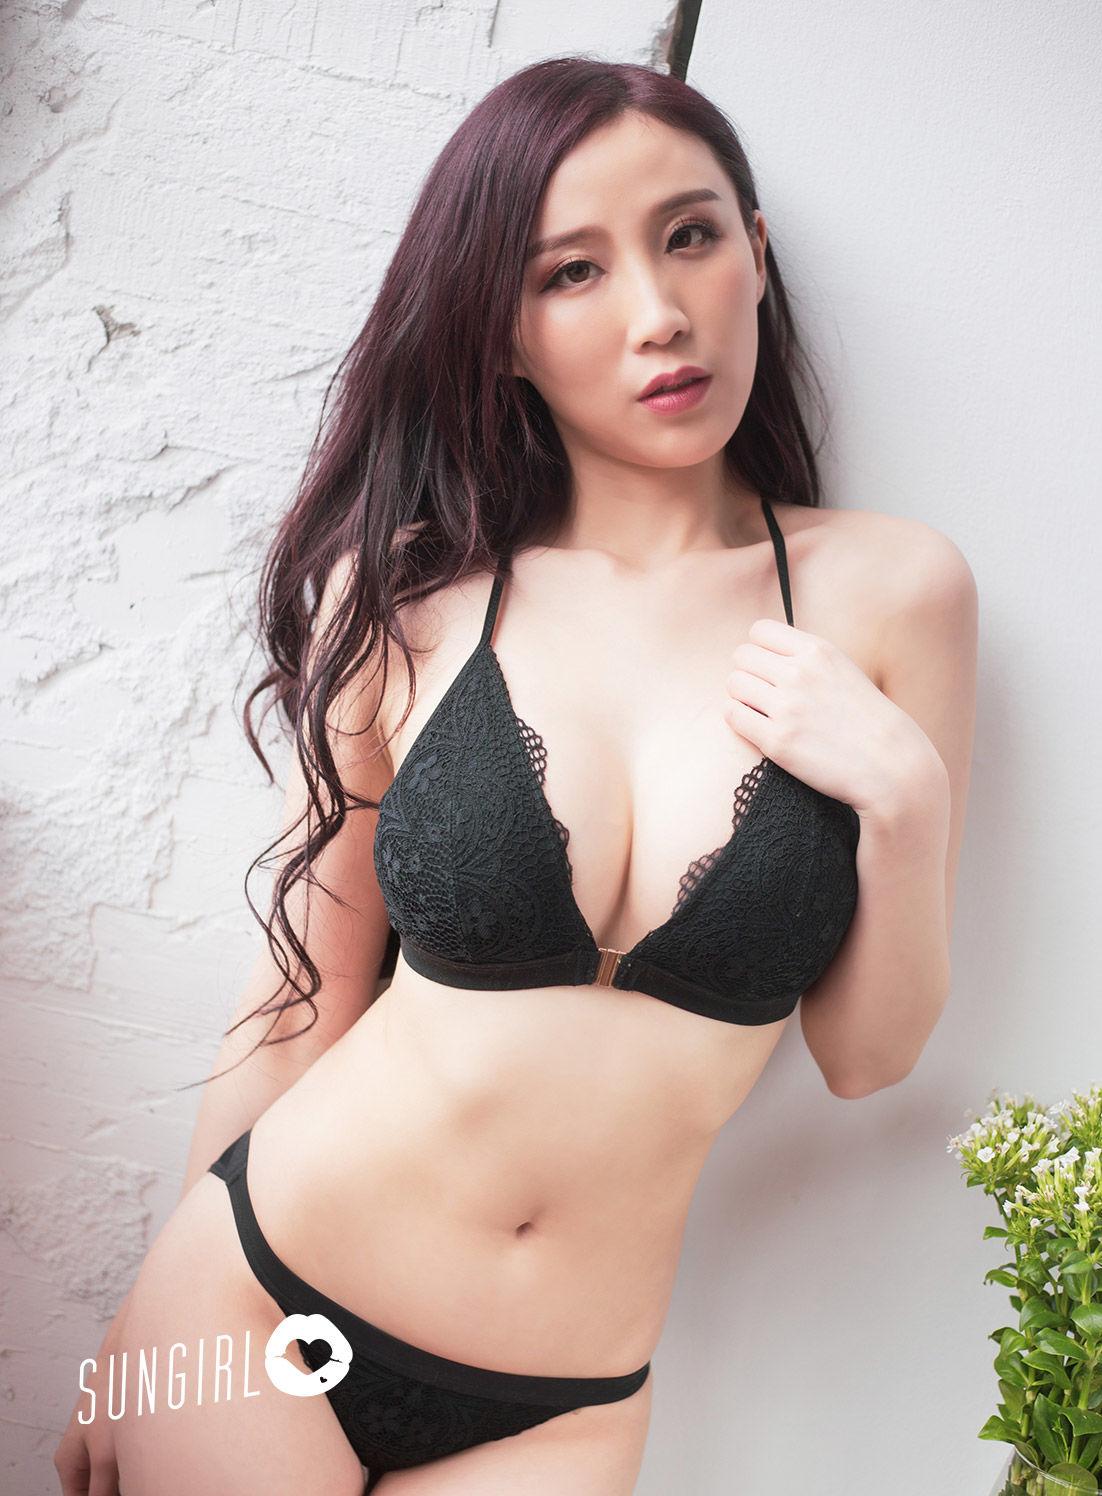 VOL.1527 [阳光宝贝]美胸爆乳轻熟女:黄蔓蔓Irene(蔓蔓宝宝)超高清个人性感漂亮大图(32P)